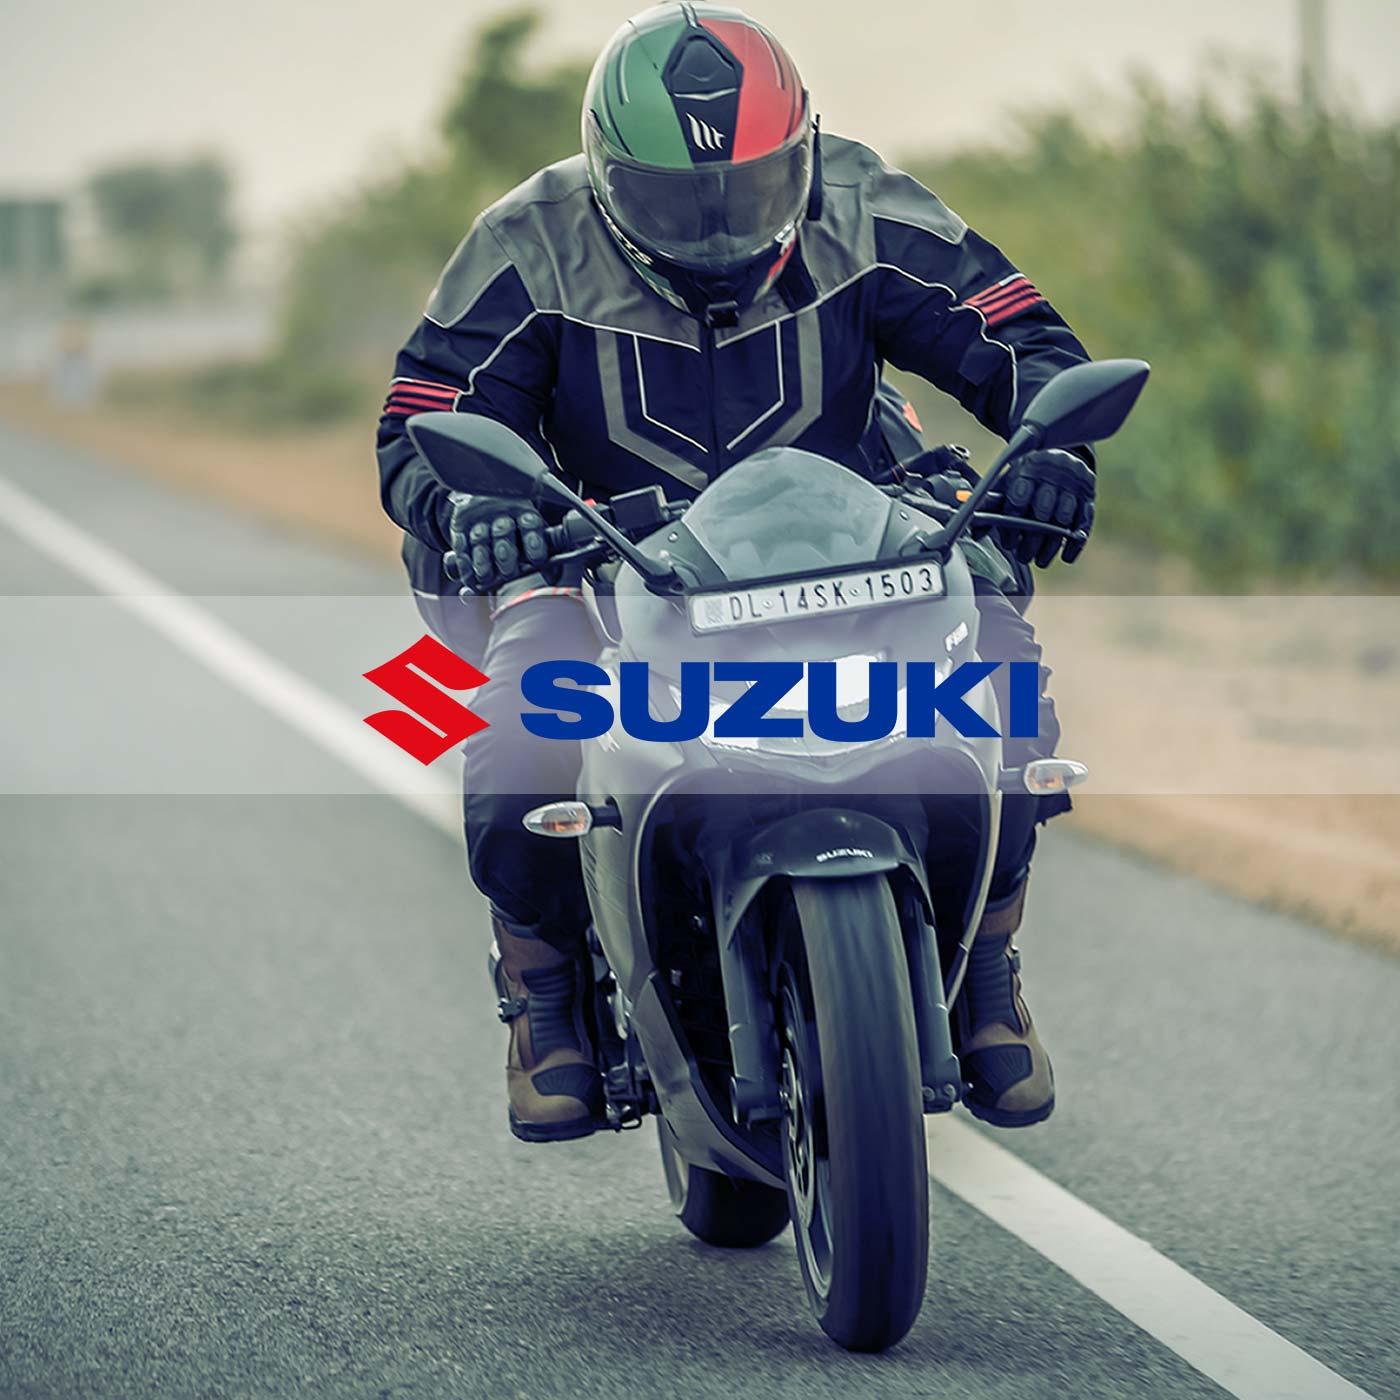 Brownsugr, Suzuki India